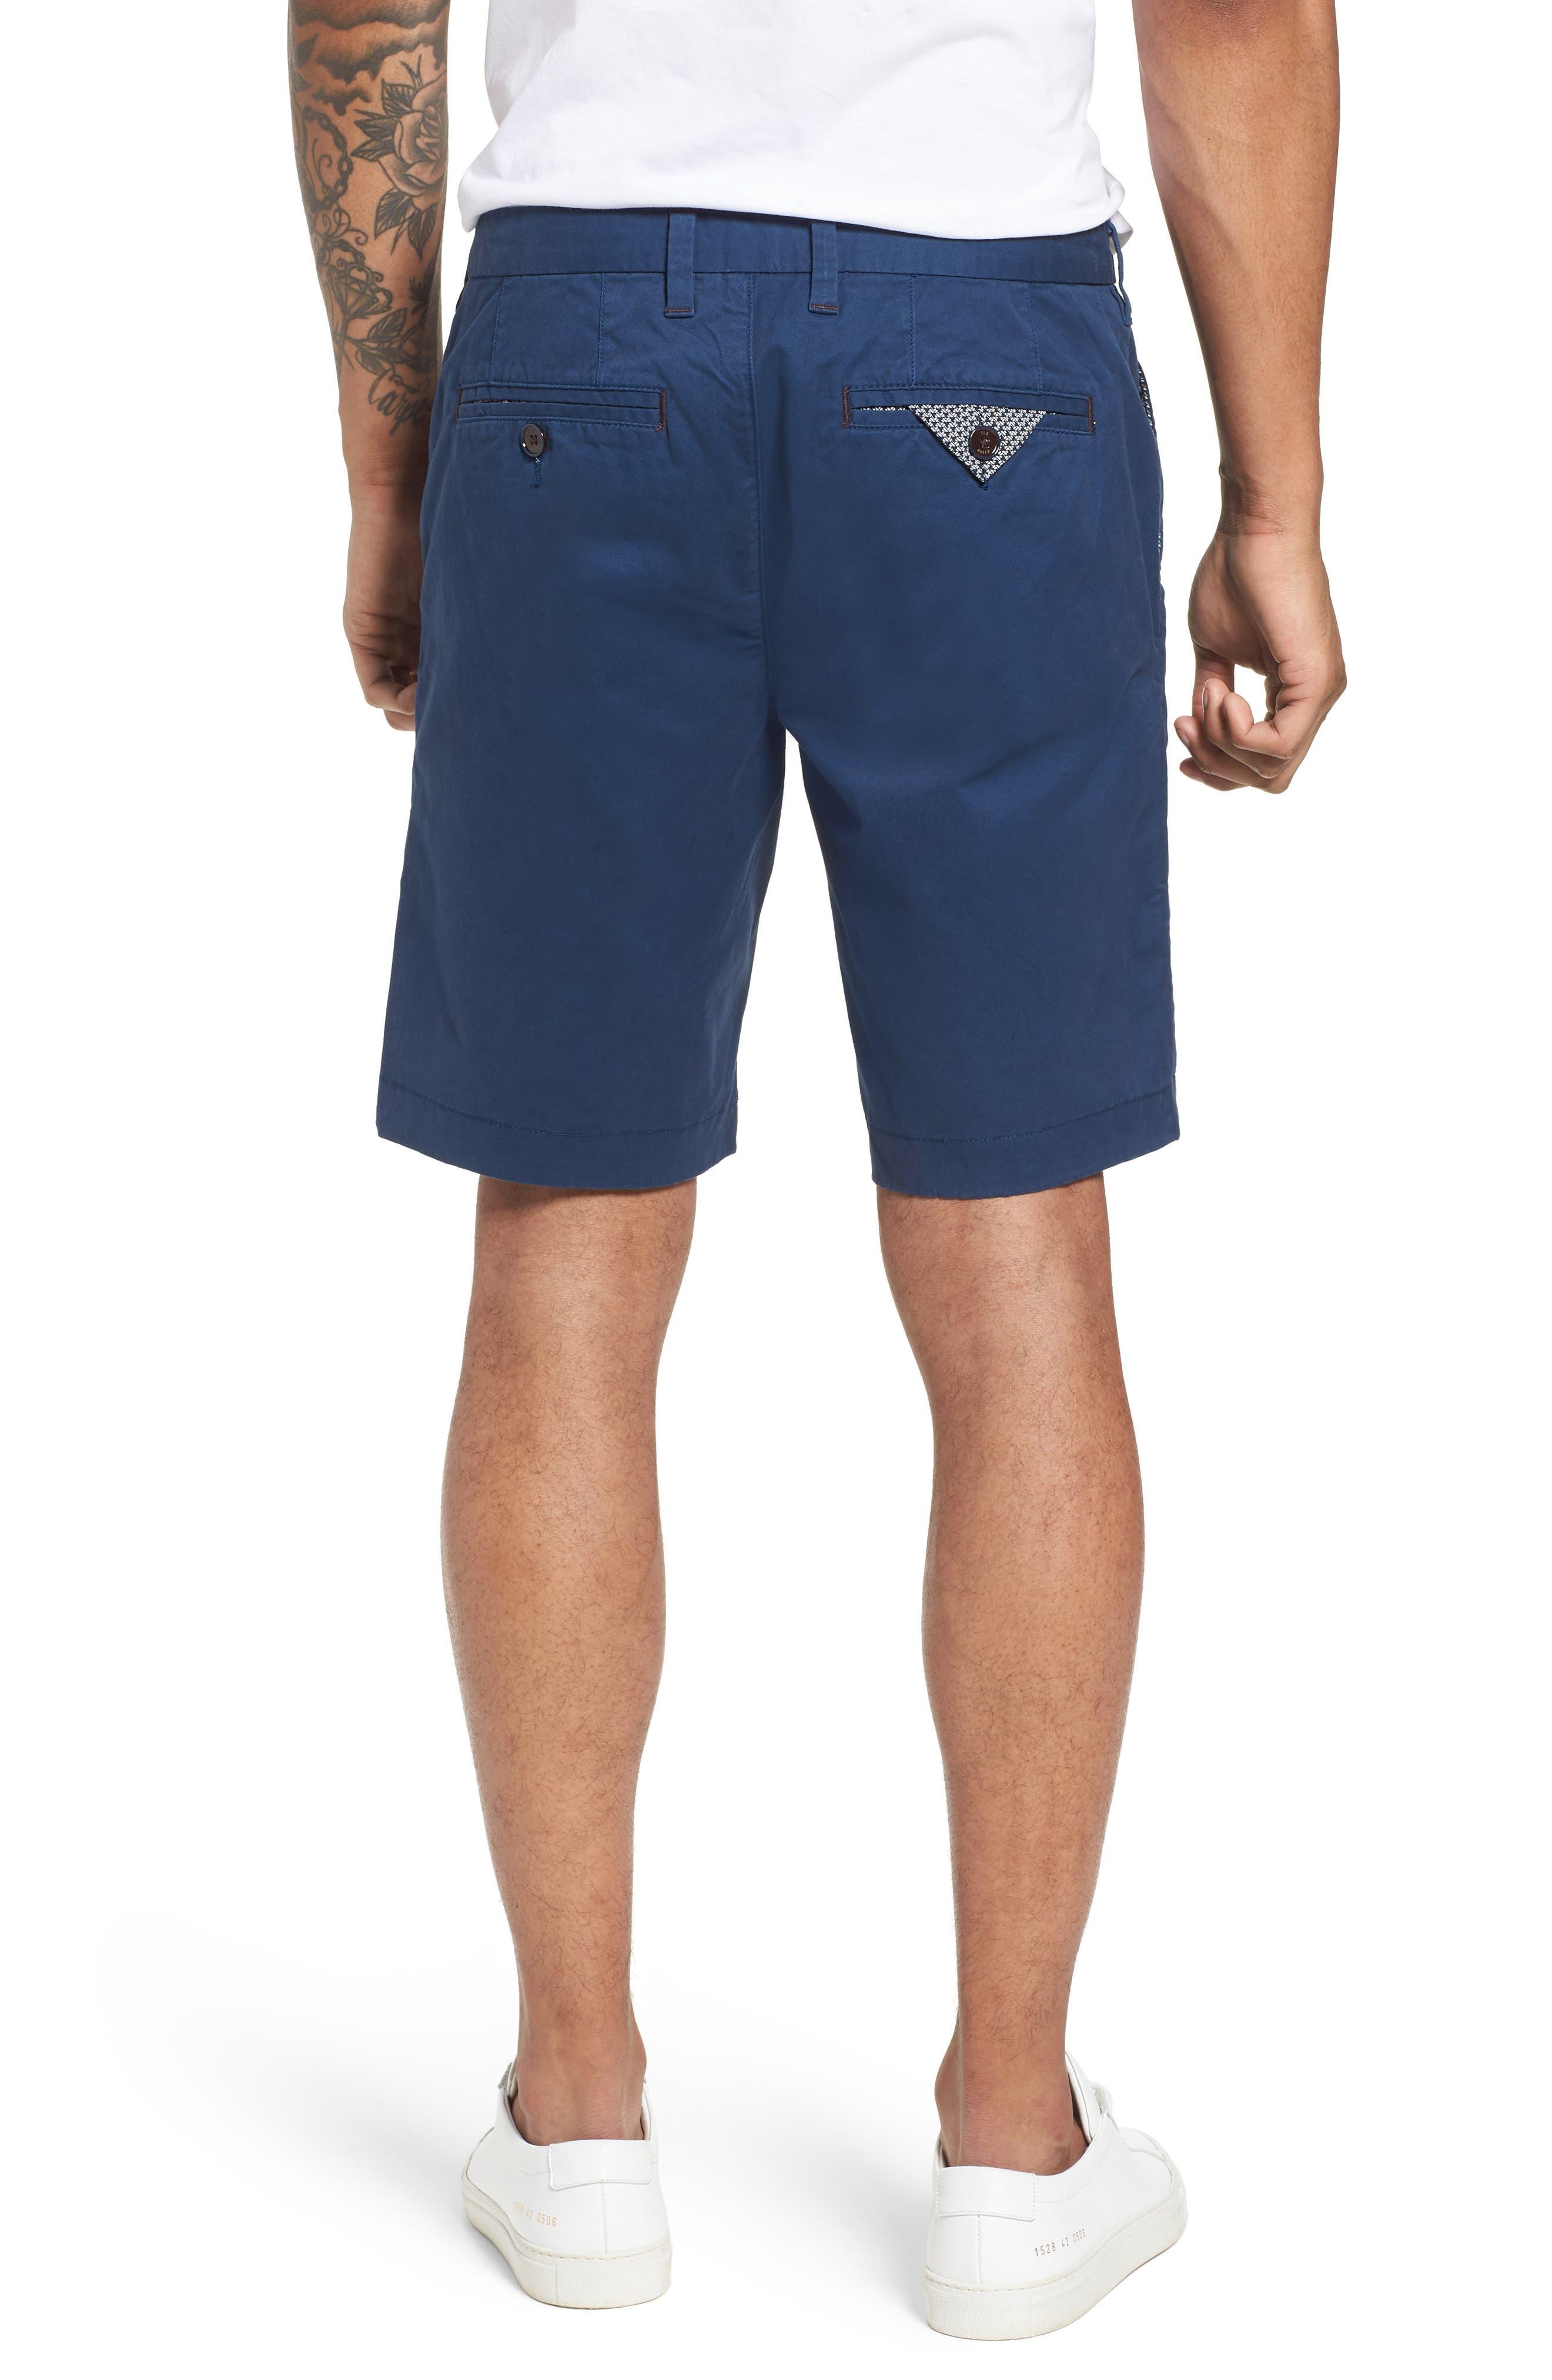 Proshor Slim Fit Chino Shorts,                             Alternate thumbnail 2, color,                             Dark Blue